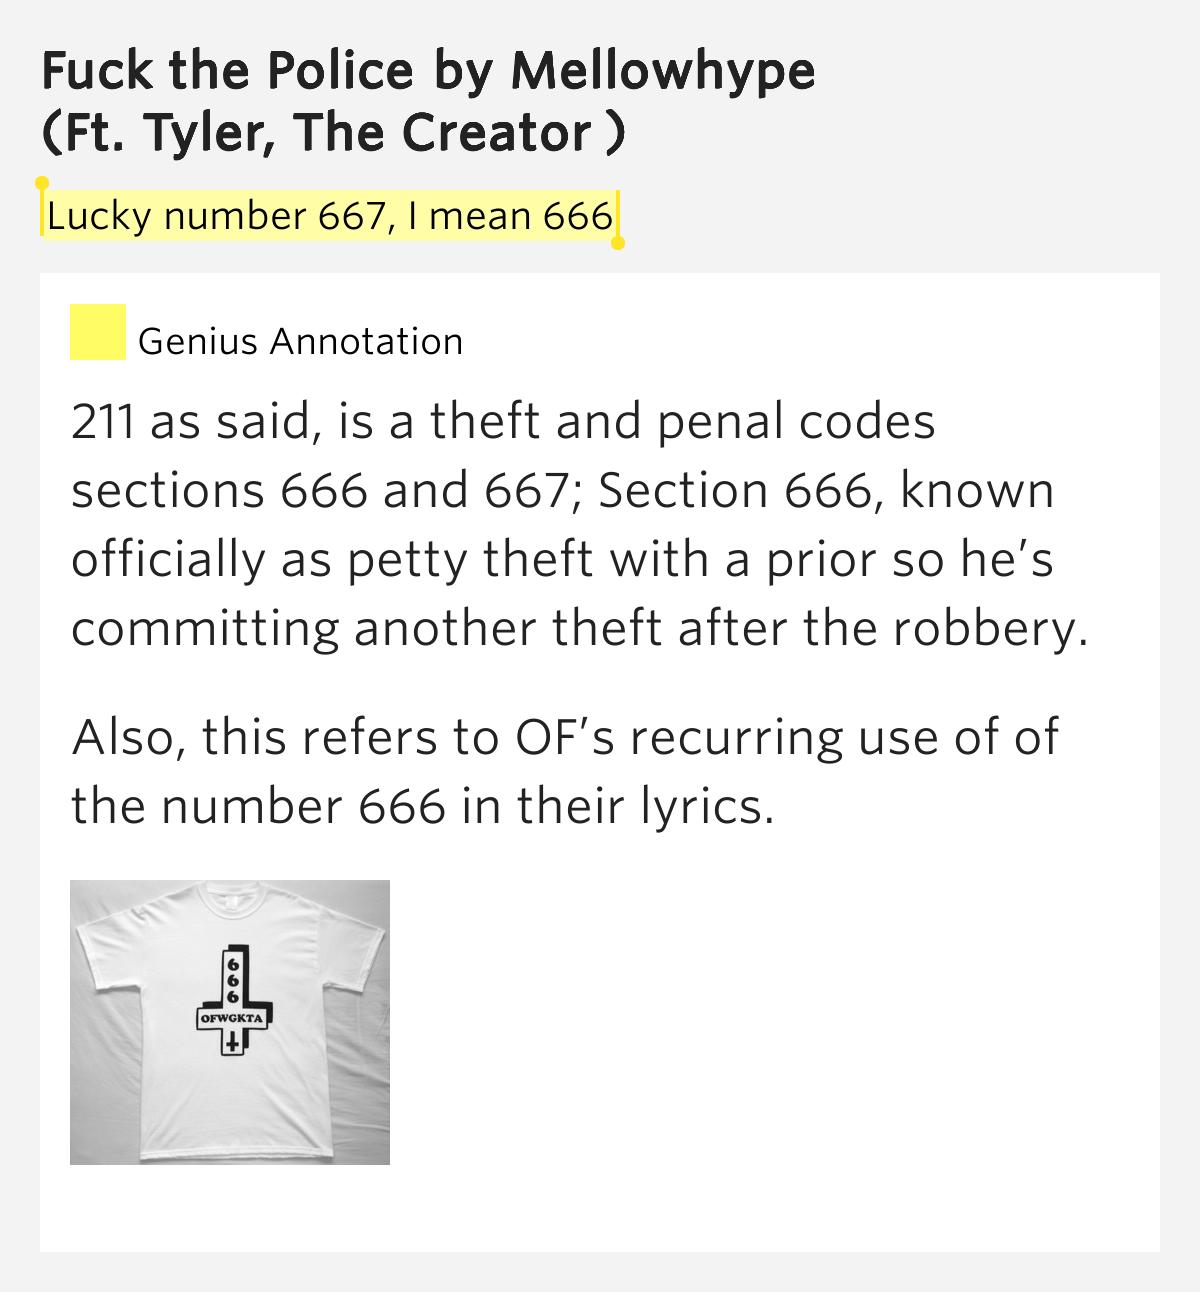 NWA Lyrics - Fuck The Police - Song Lyrics from A to Z